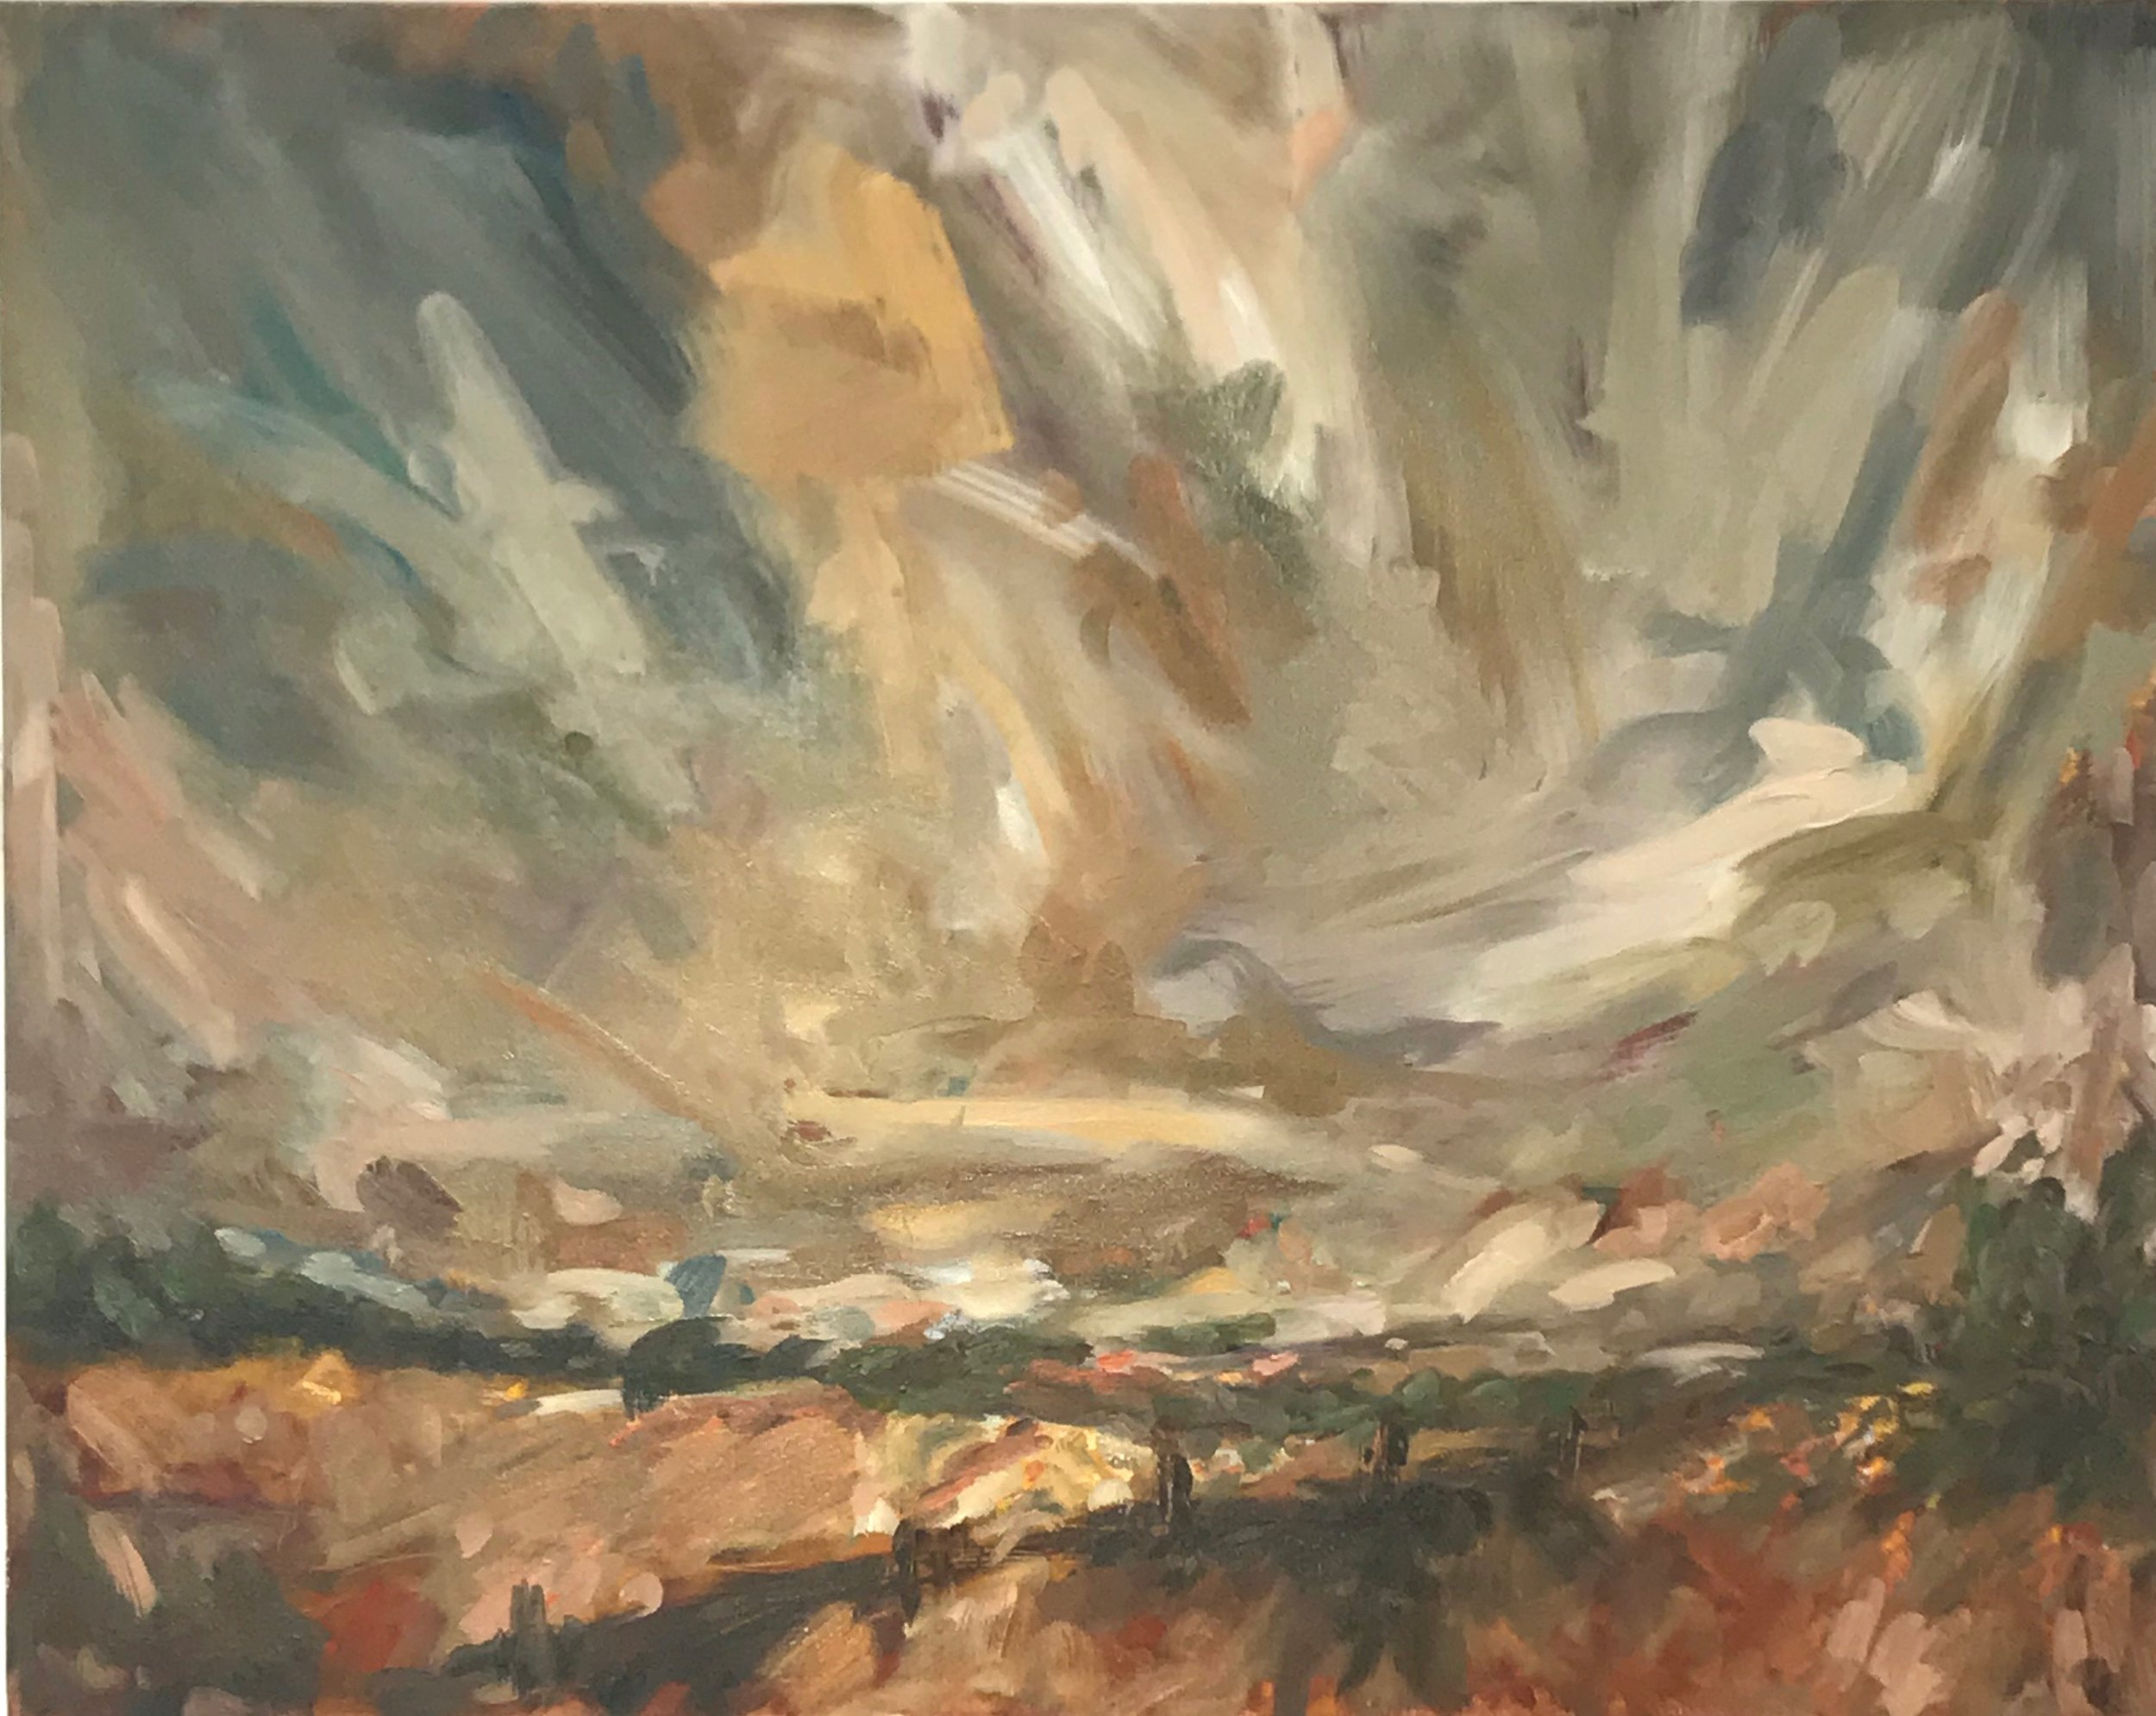 Memories of Deloraine II, 80x120cm oil on canvas